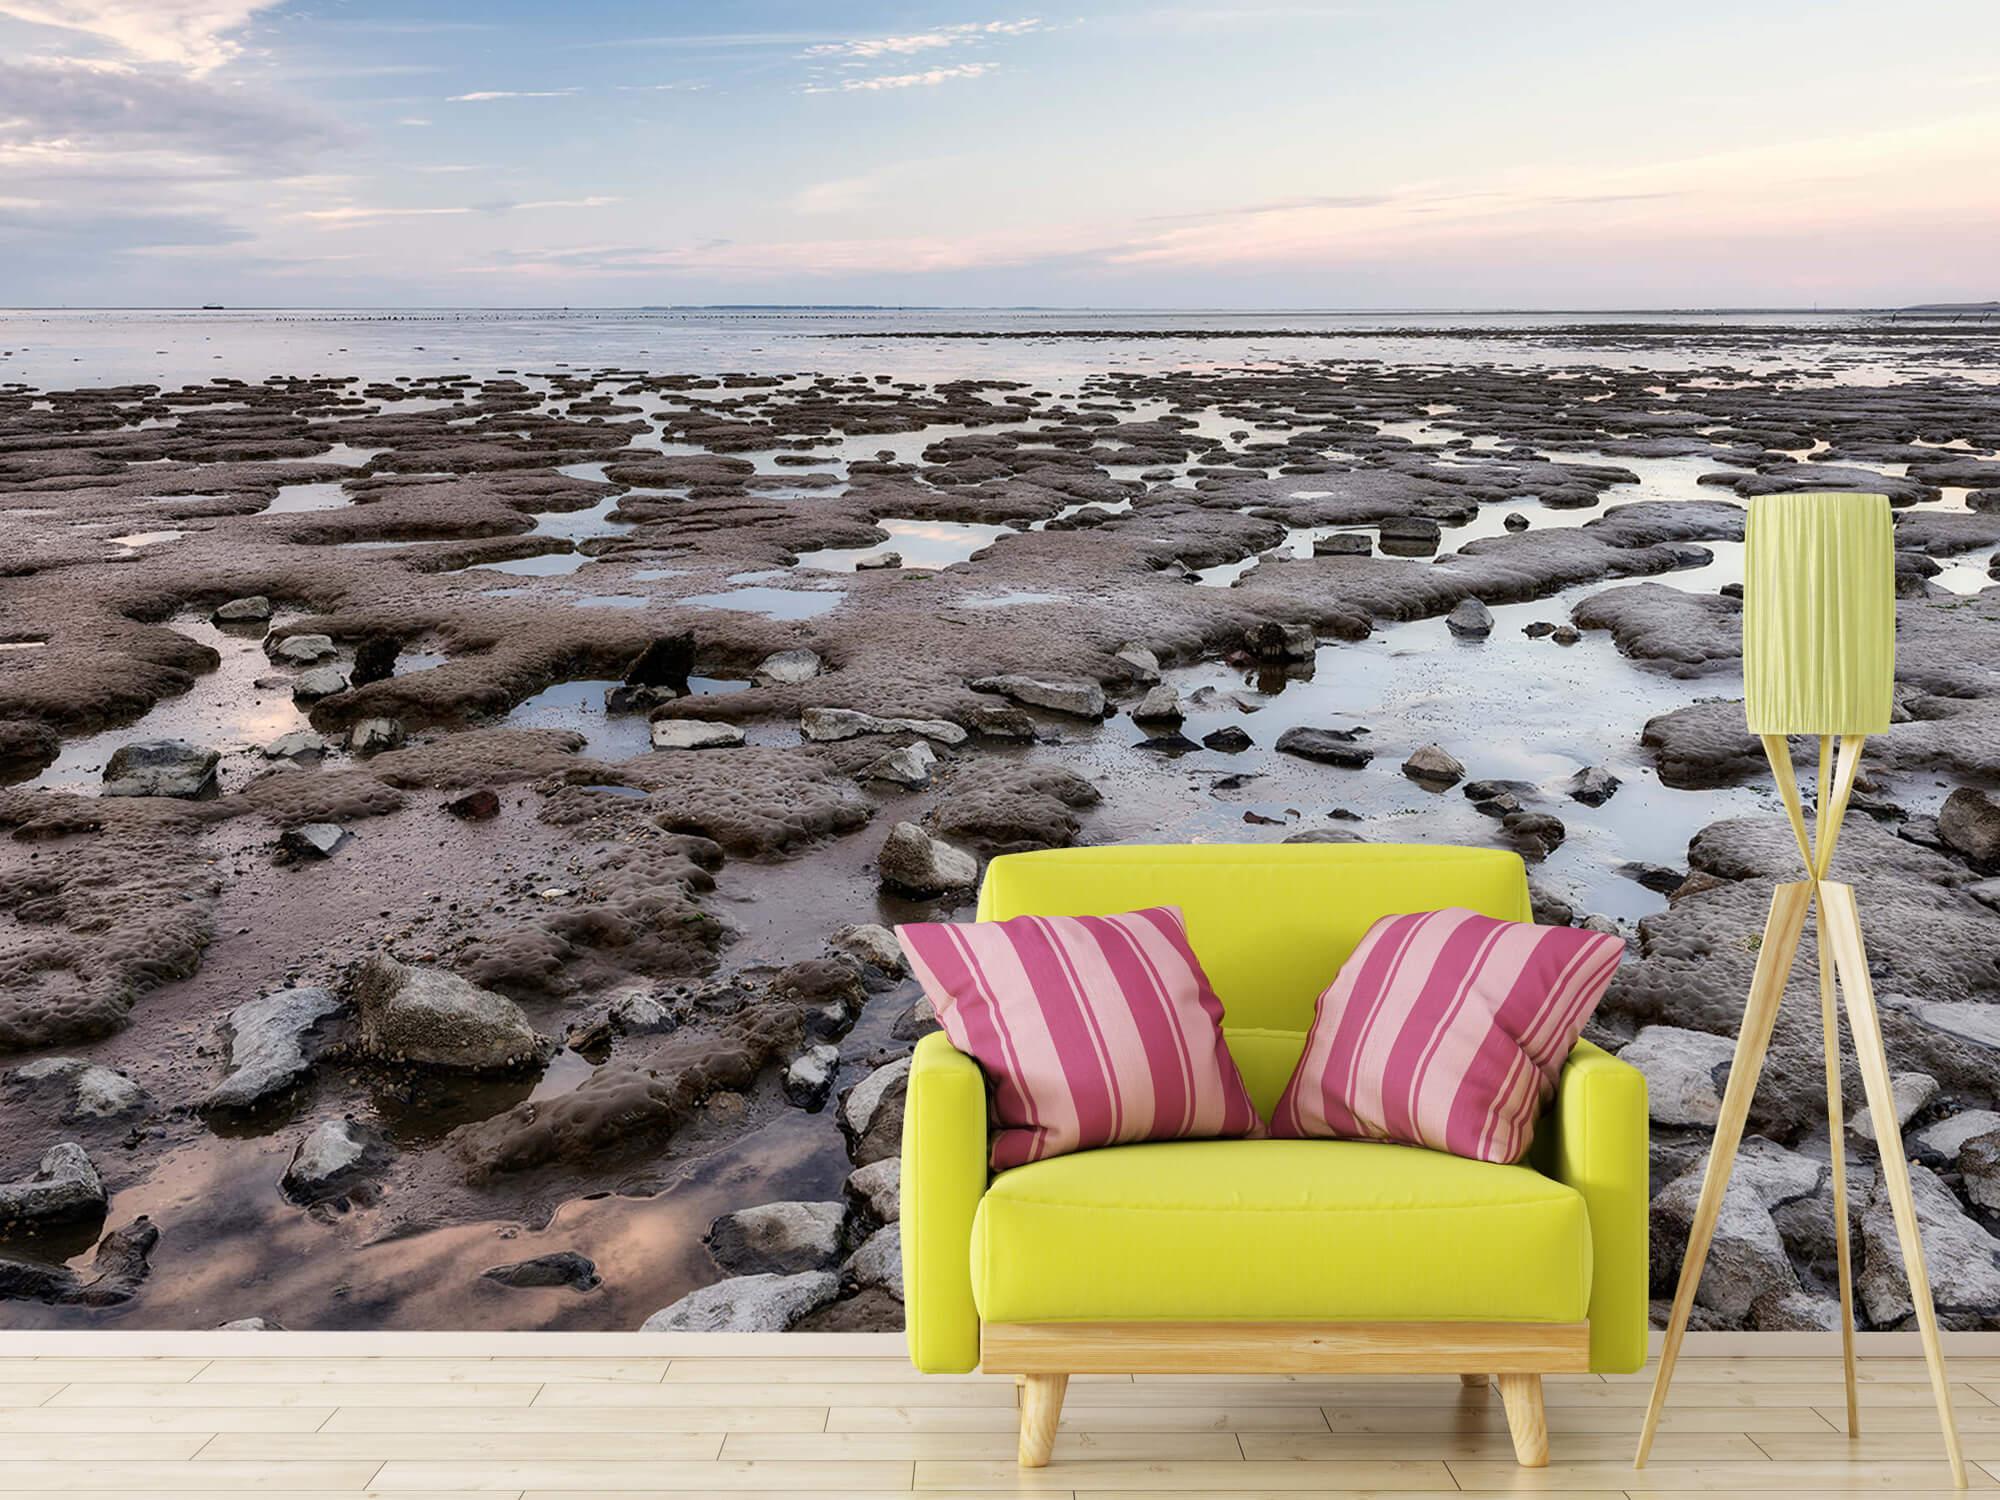 Strand - Stenen langs de kust 17